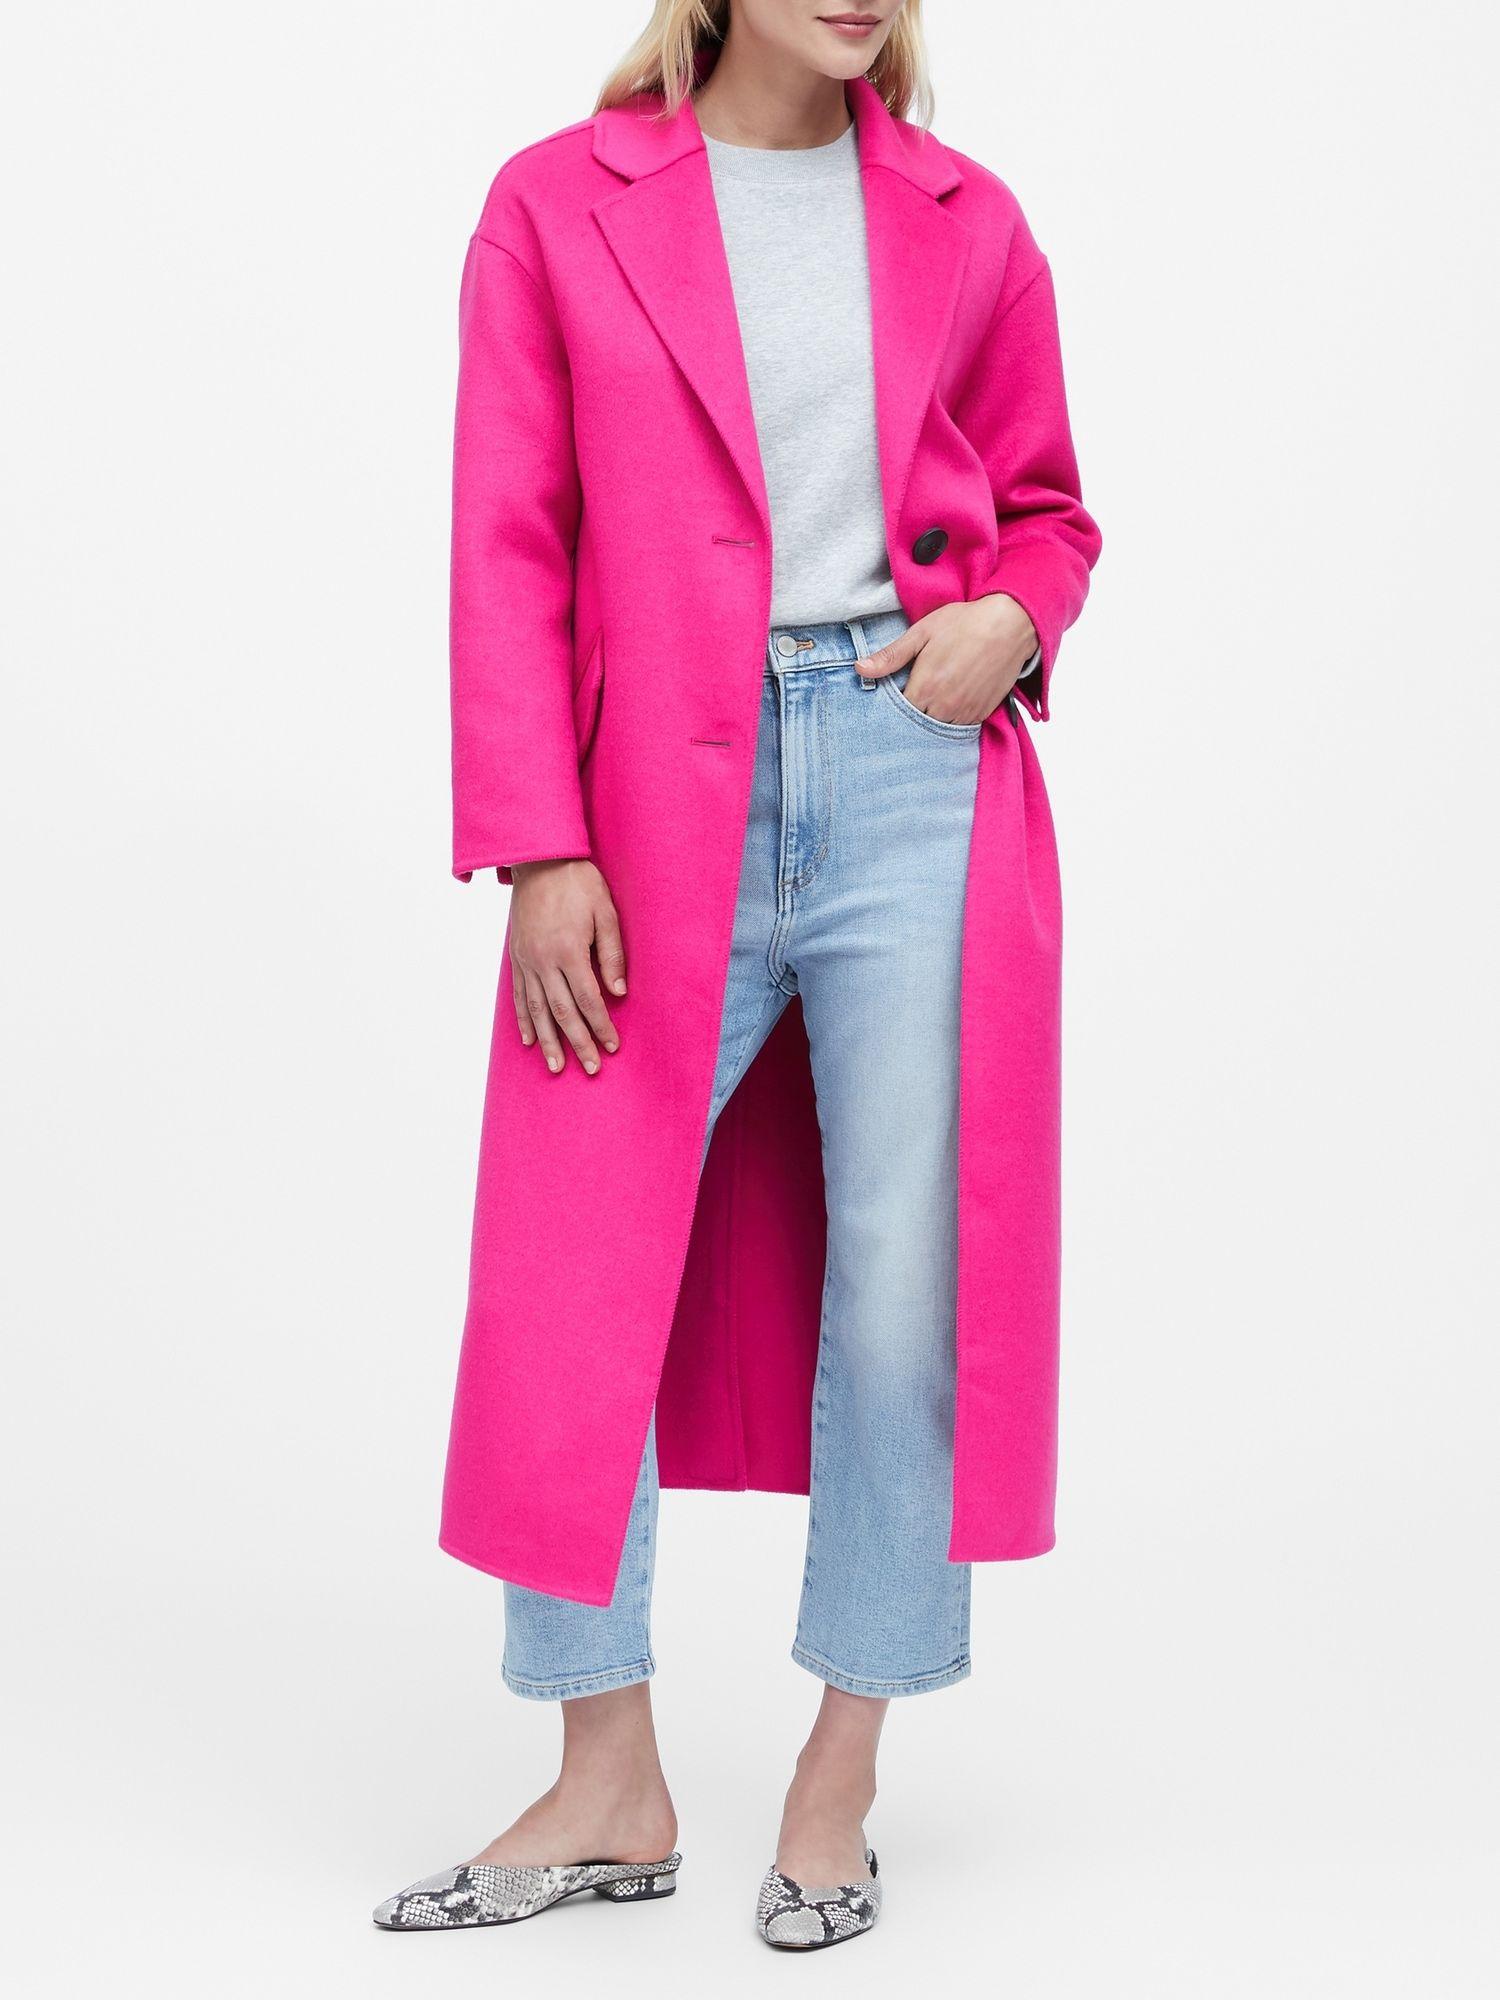 Japan Exclusive Double Faced Unlined Coat Banana Republic Coat Hot Sweater Pink Wool Coat [ 2000 x 1500 Pixel ]